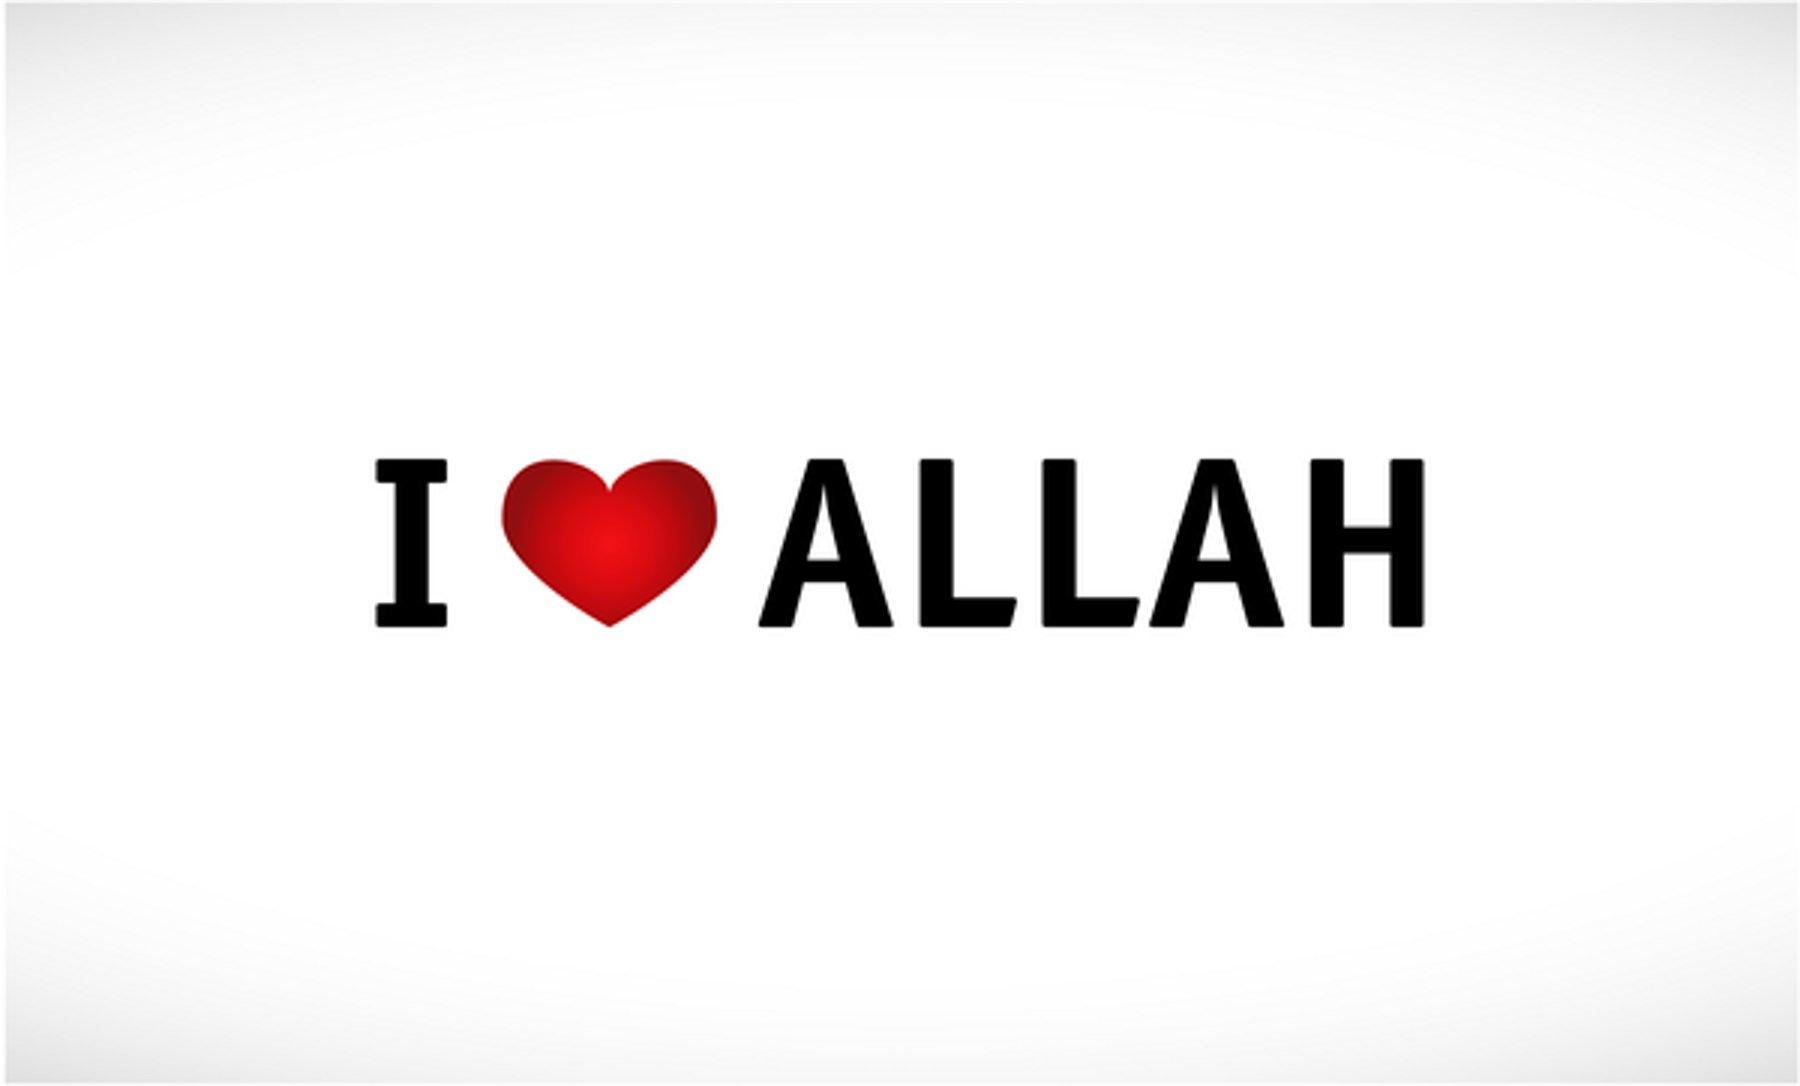 I Love Allah Wallpaper cute : ??? ????? ????? ??? ??????? hd - ??? ????? ????? ??? ????